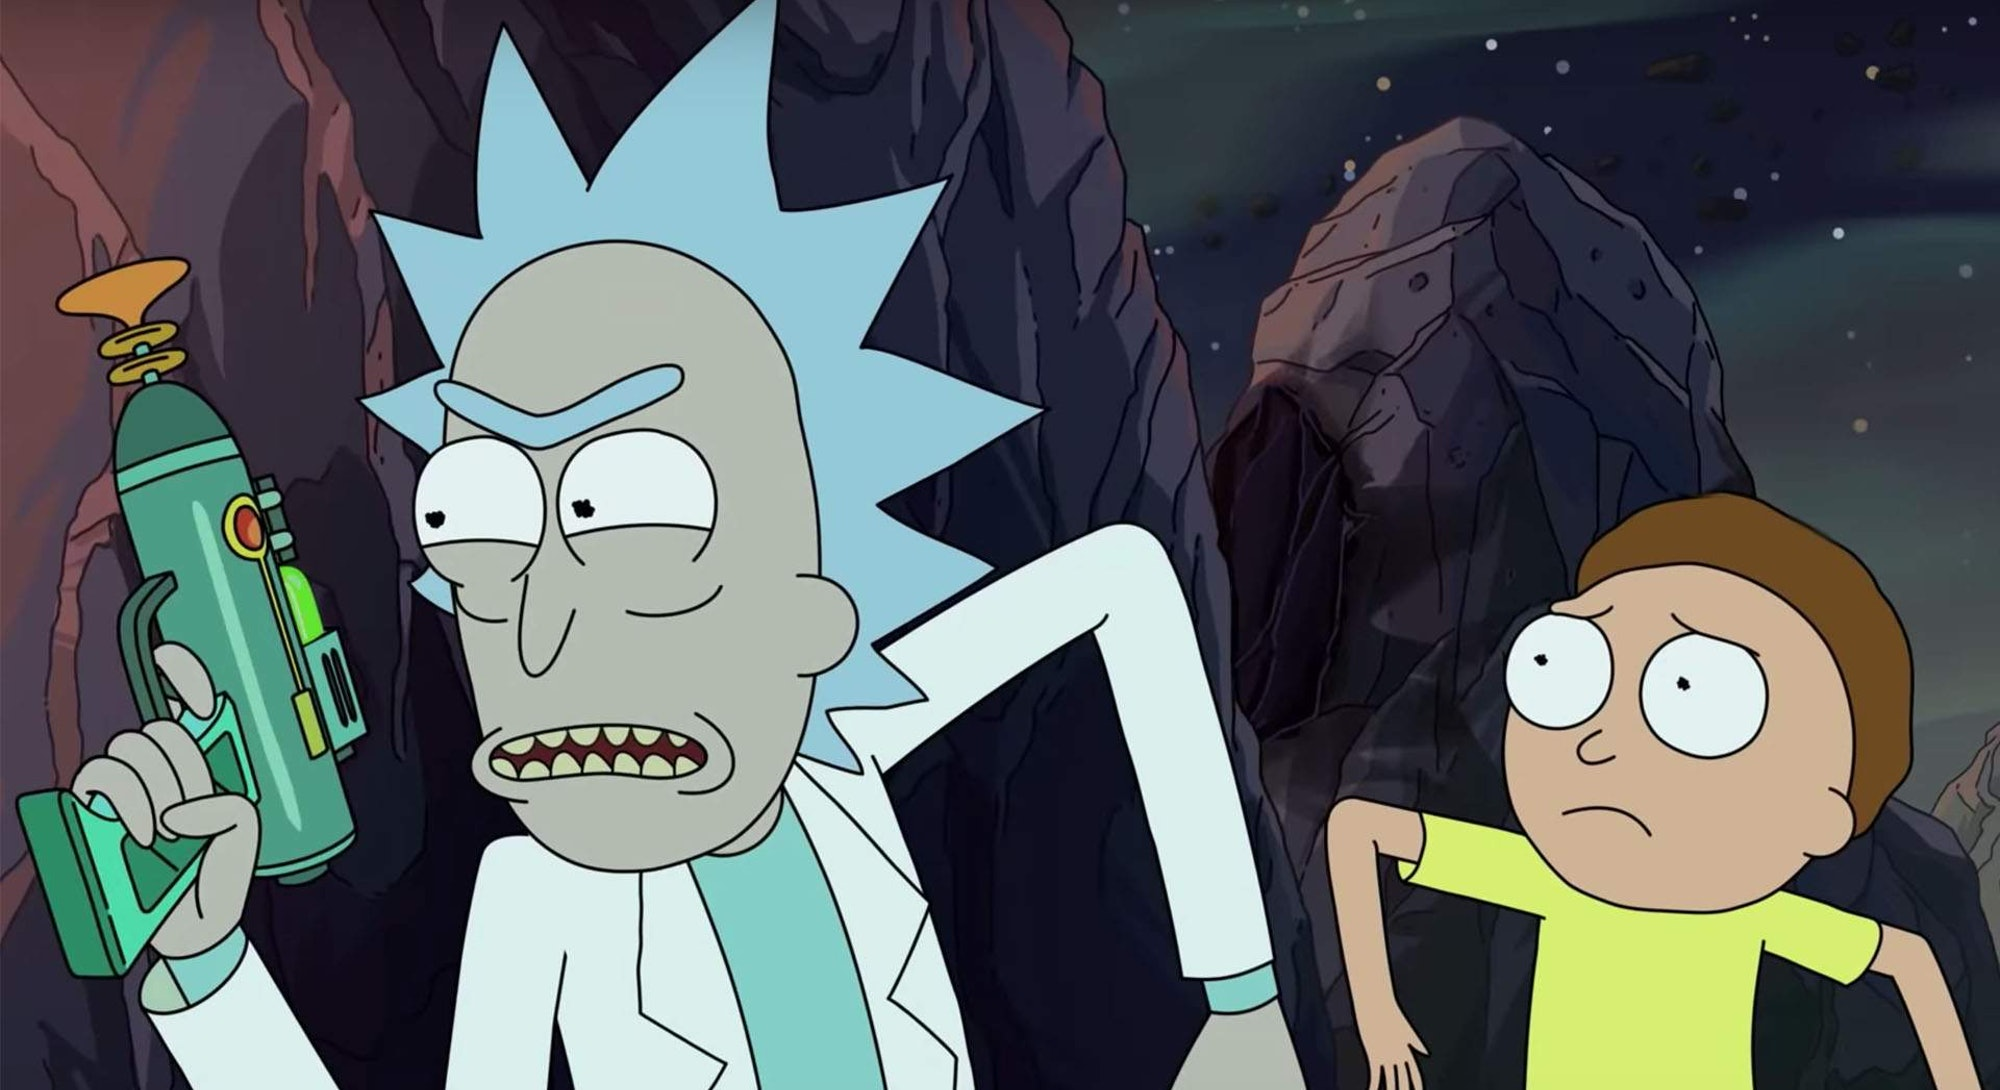 Rick and Morty Season 5: Dan Harmom Says More on Schedule